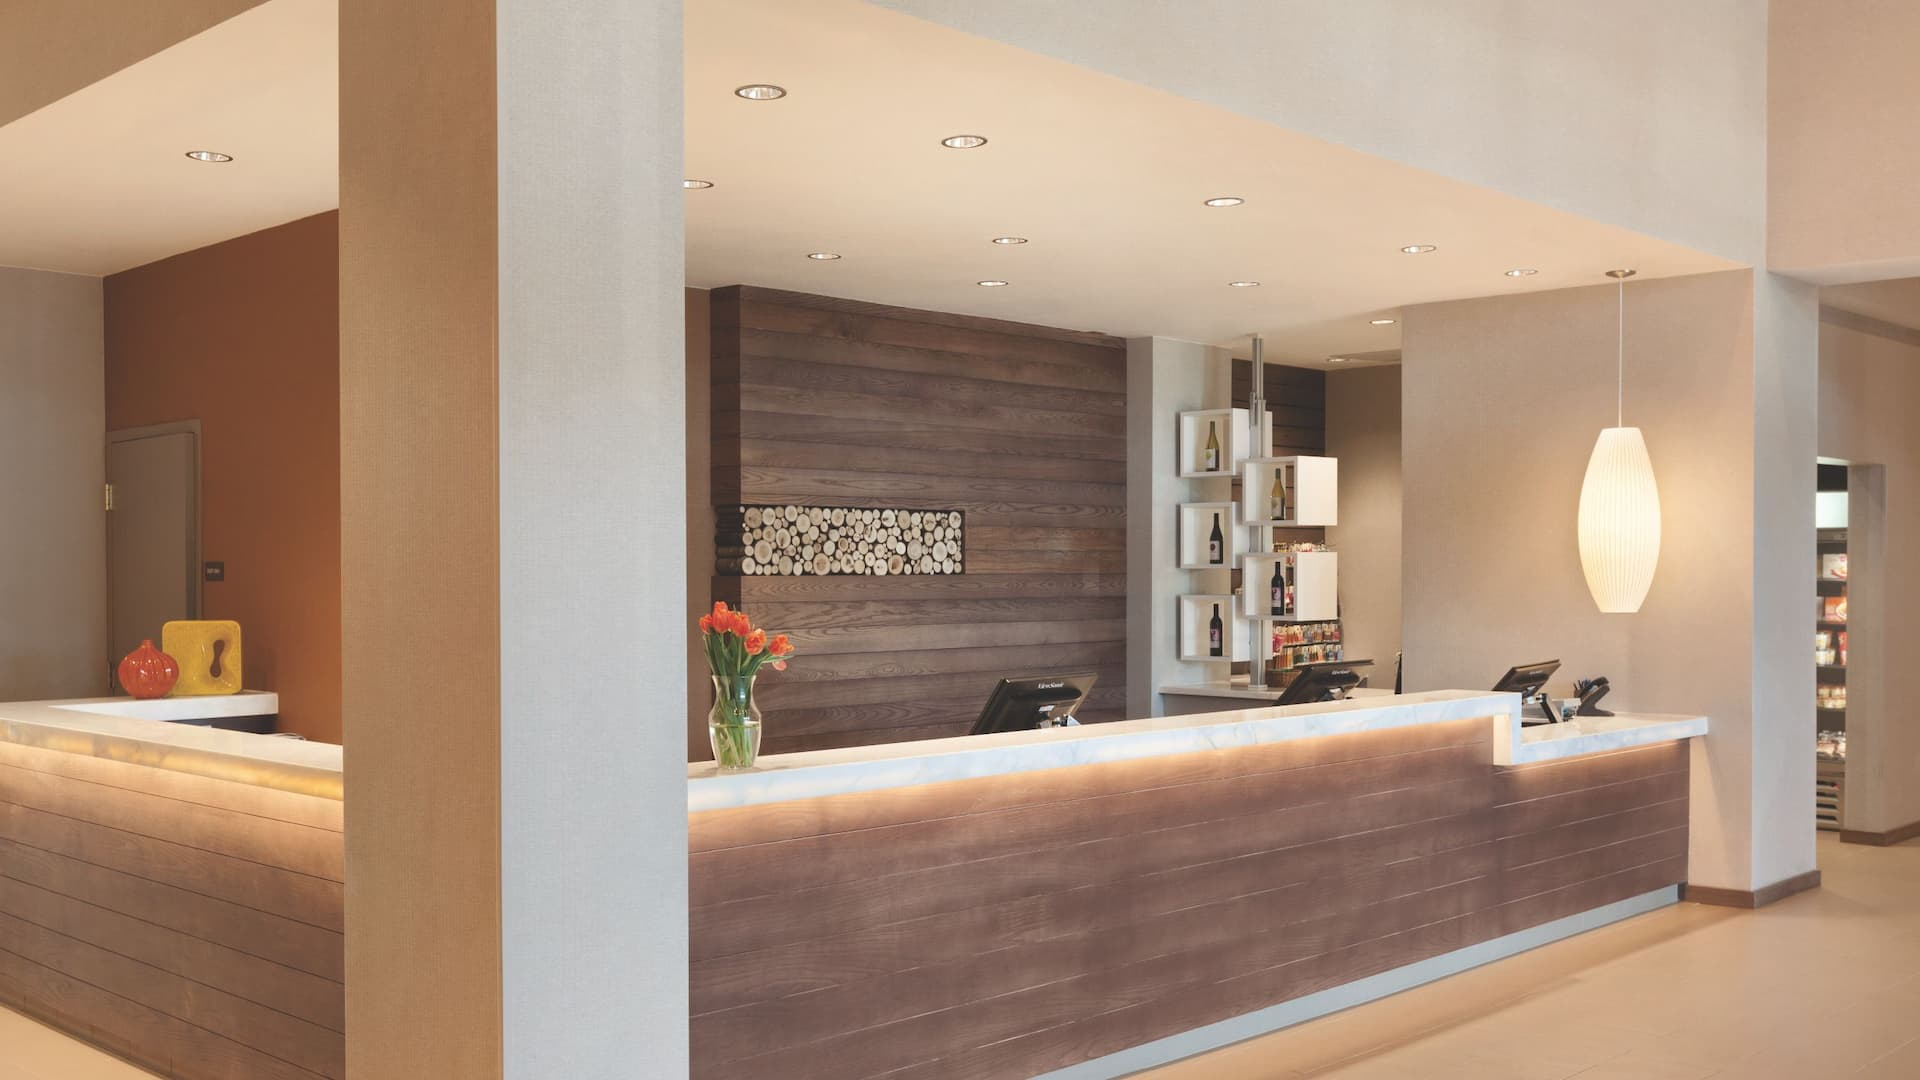 Hyatt House Emeryville / San Francisco Bay Area Lobby